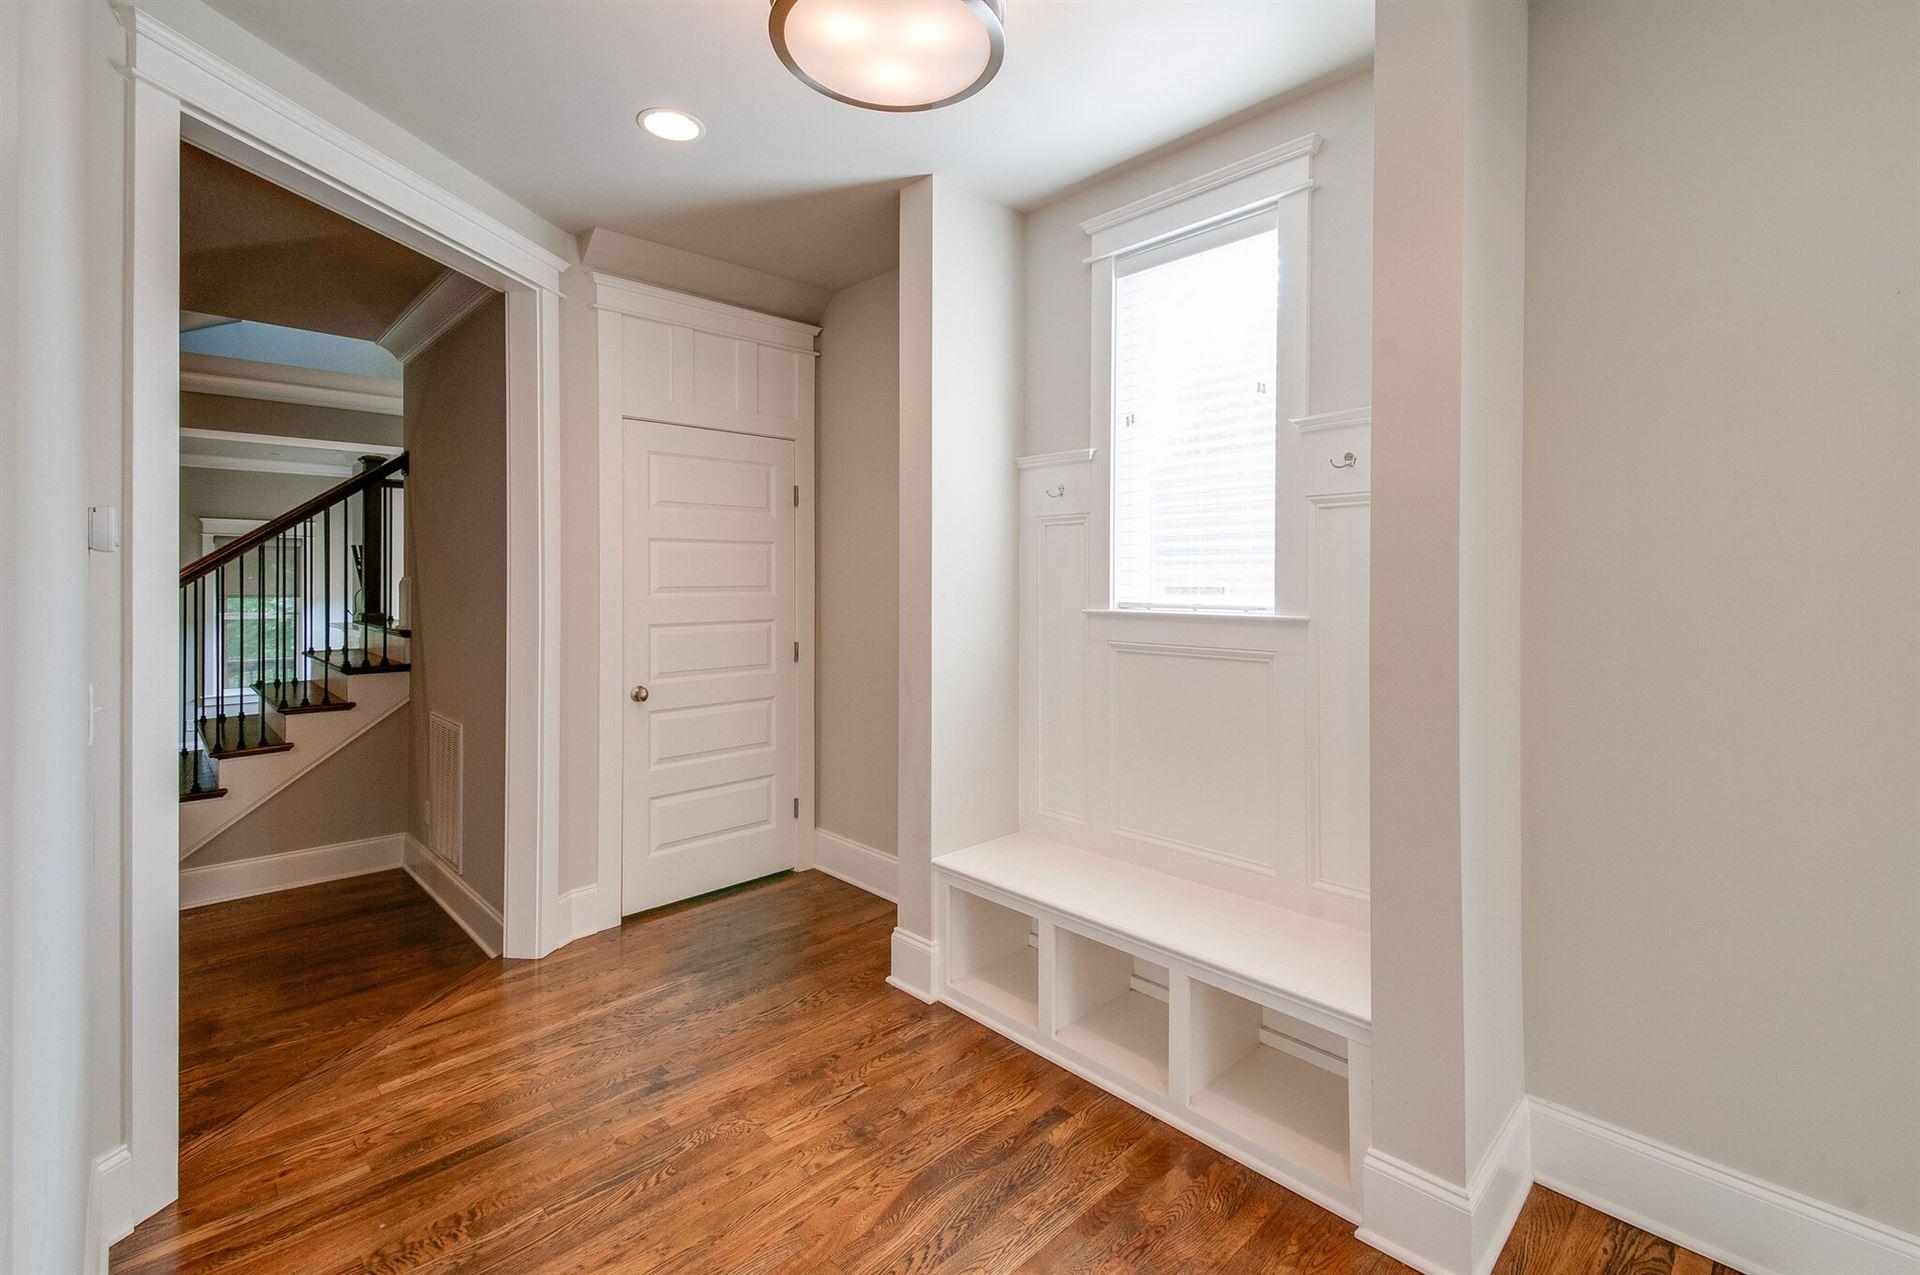 Photo of 78 Brookwood Terrace #A, Nashville, TN 37205 (MLS # 2291442)